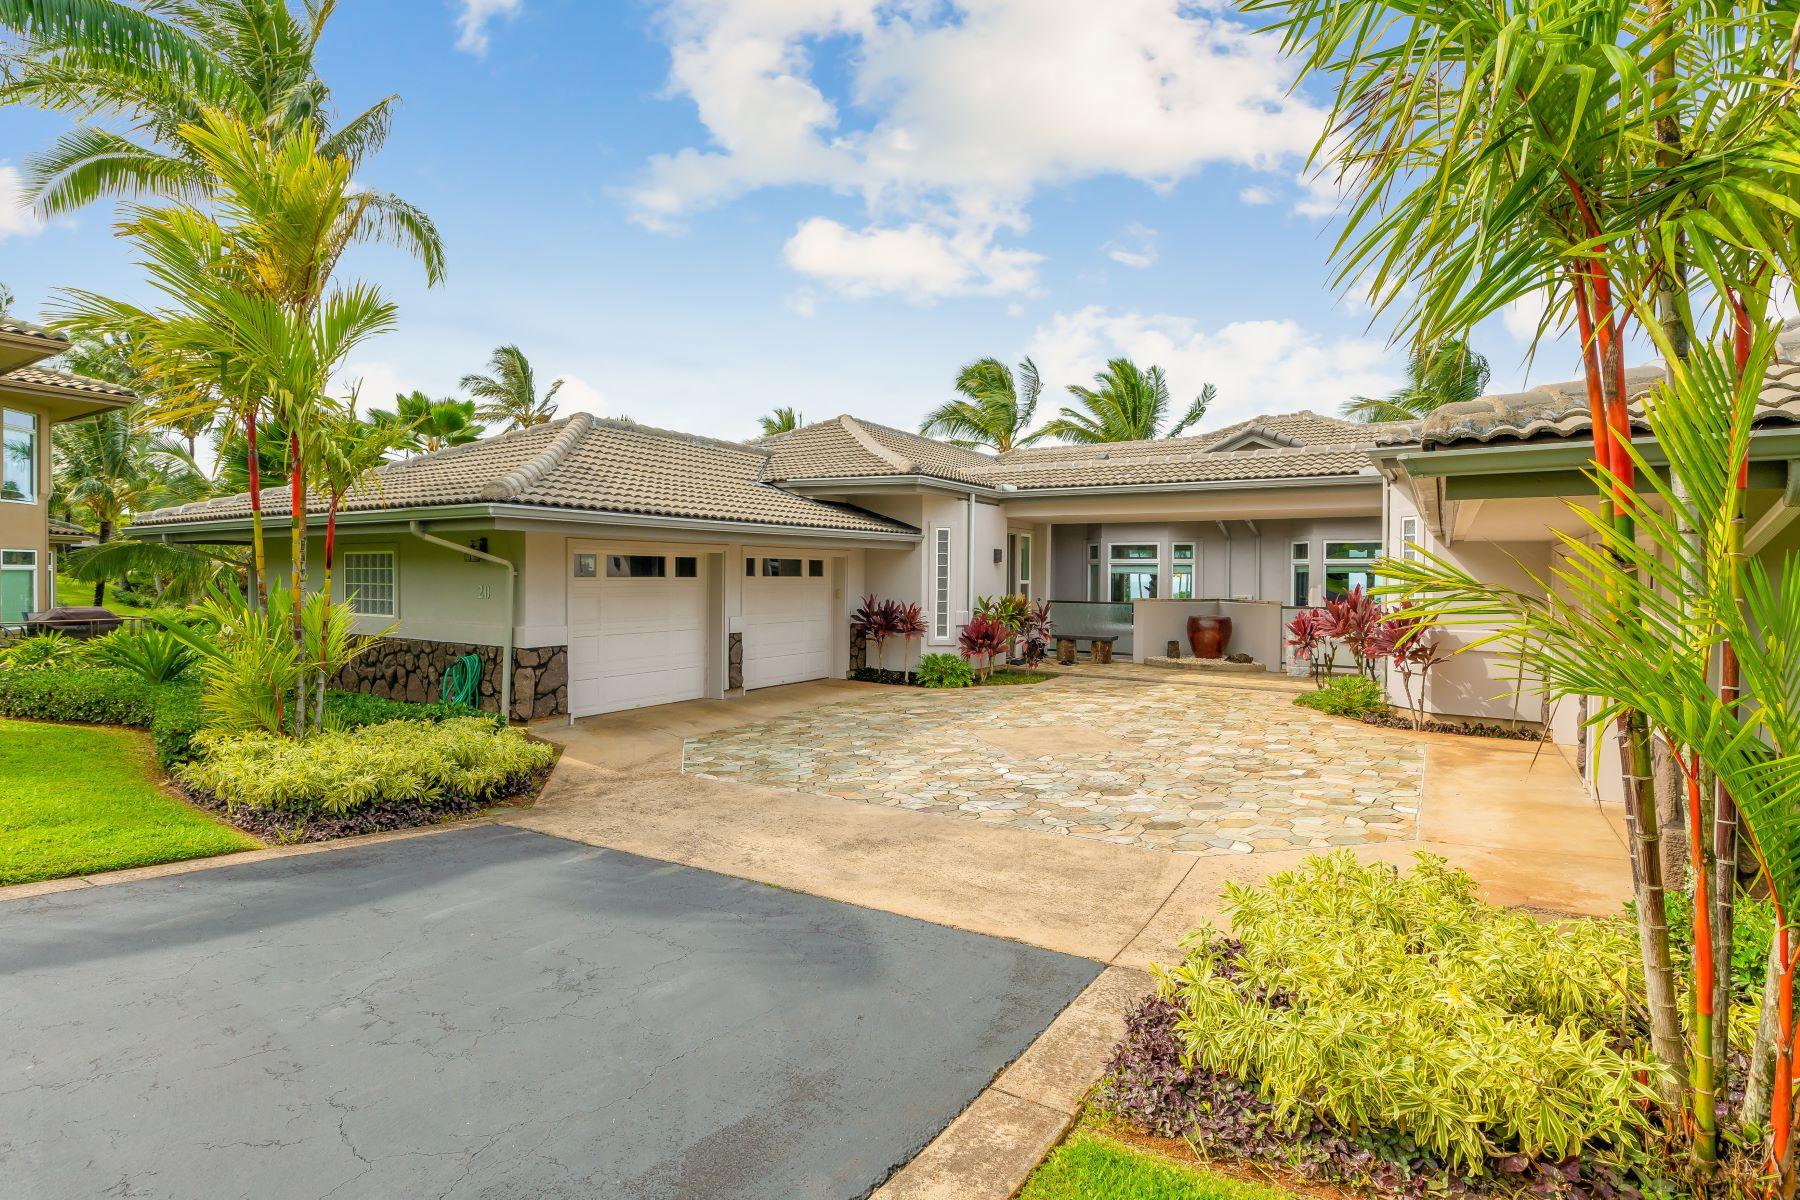 Condominiums 为 销售 在 4100 QUEEN EMMA DR #20 PRINCEVILLE, HI 96722 4100 QUEEN EMMA DR #20 普林斯维尔, 夏威夷 96722 美国